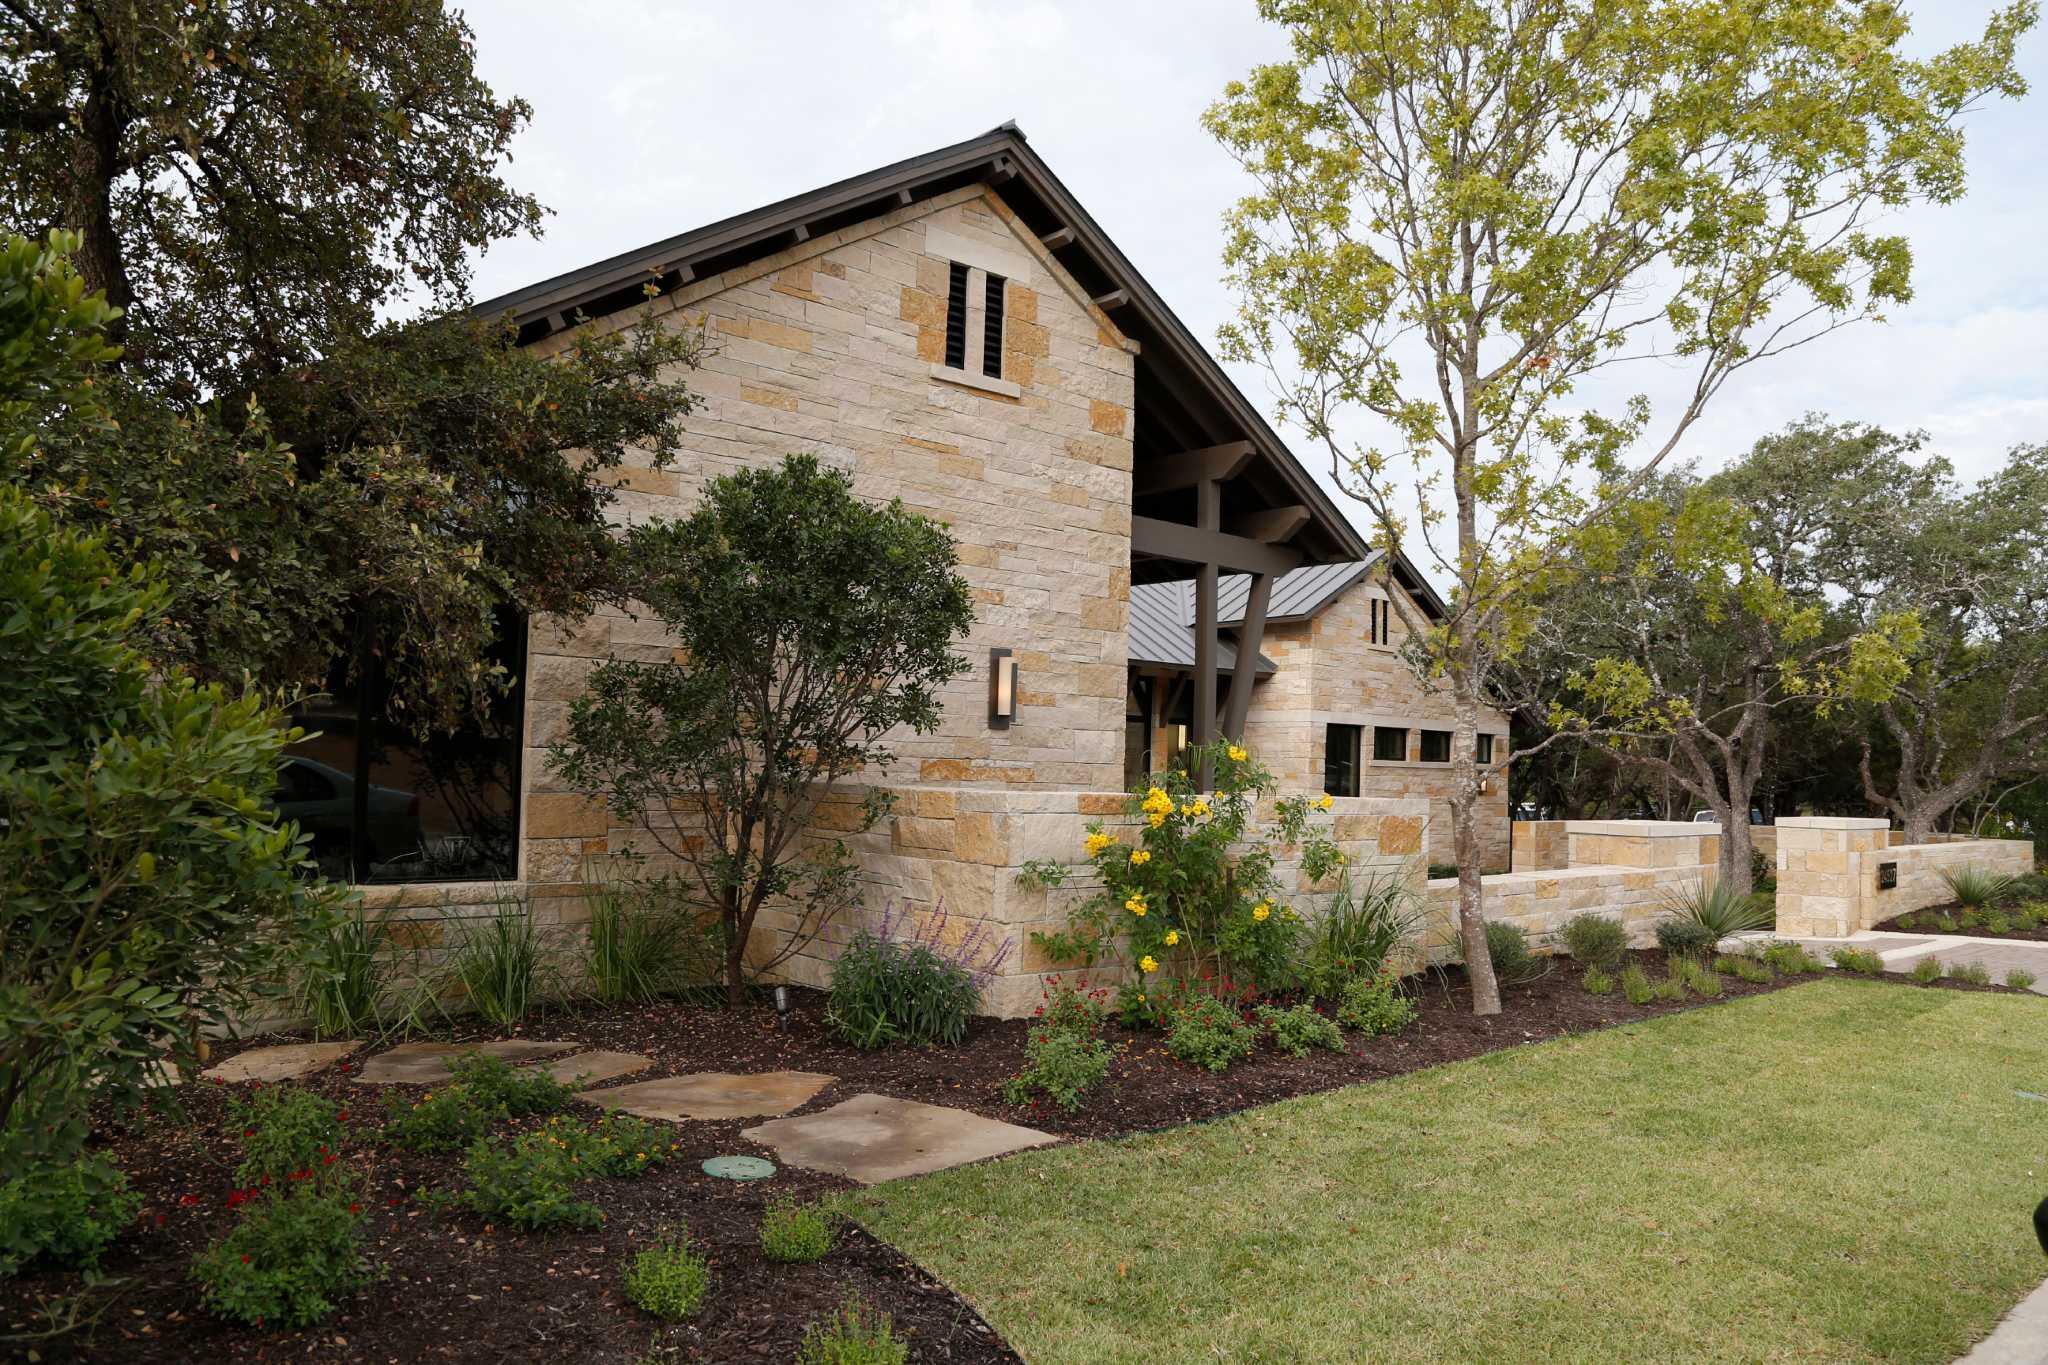 Parade of Homes brings comfy to contemporary - San Antonio Express-News